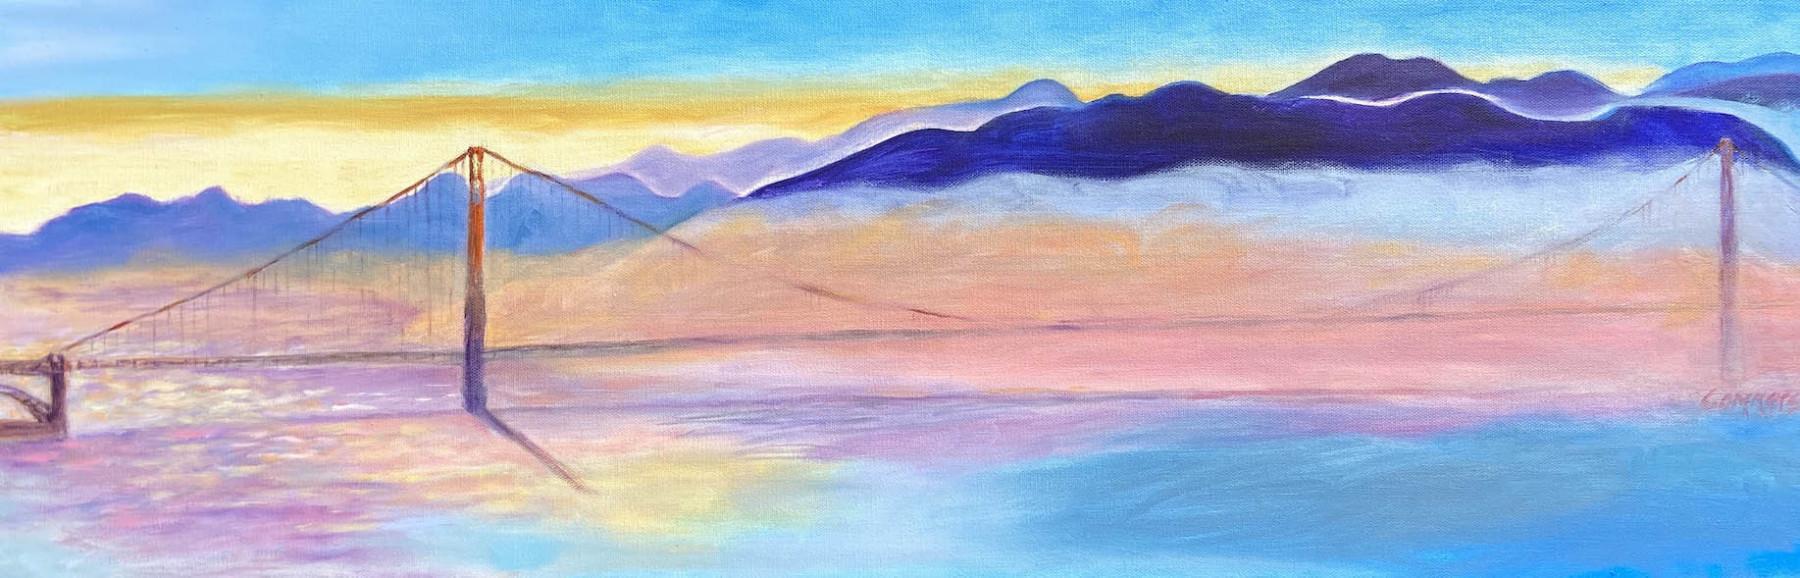 "02 Golden Gate Bridge, Acrylic on canvas, 10 x 40"""